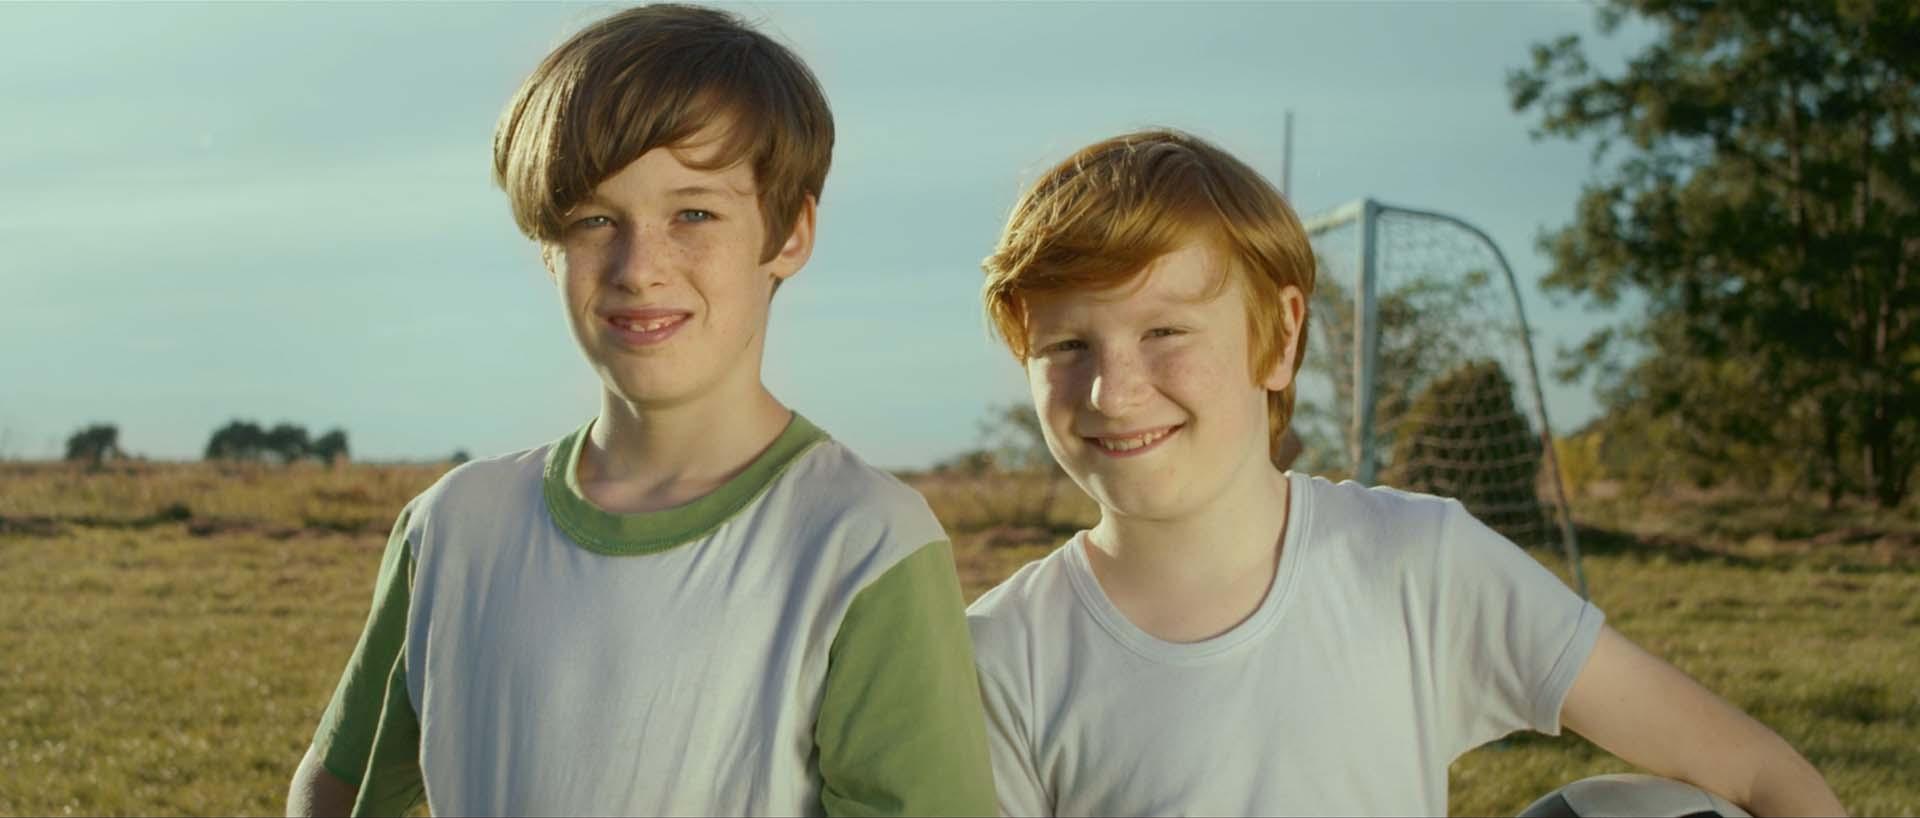 Moya - kadr z filmu